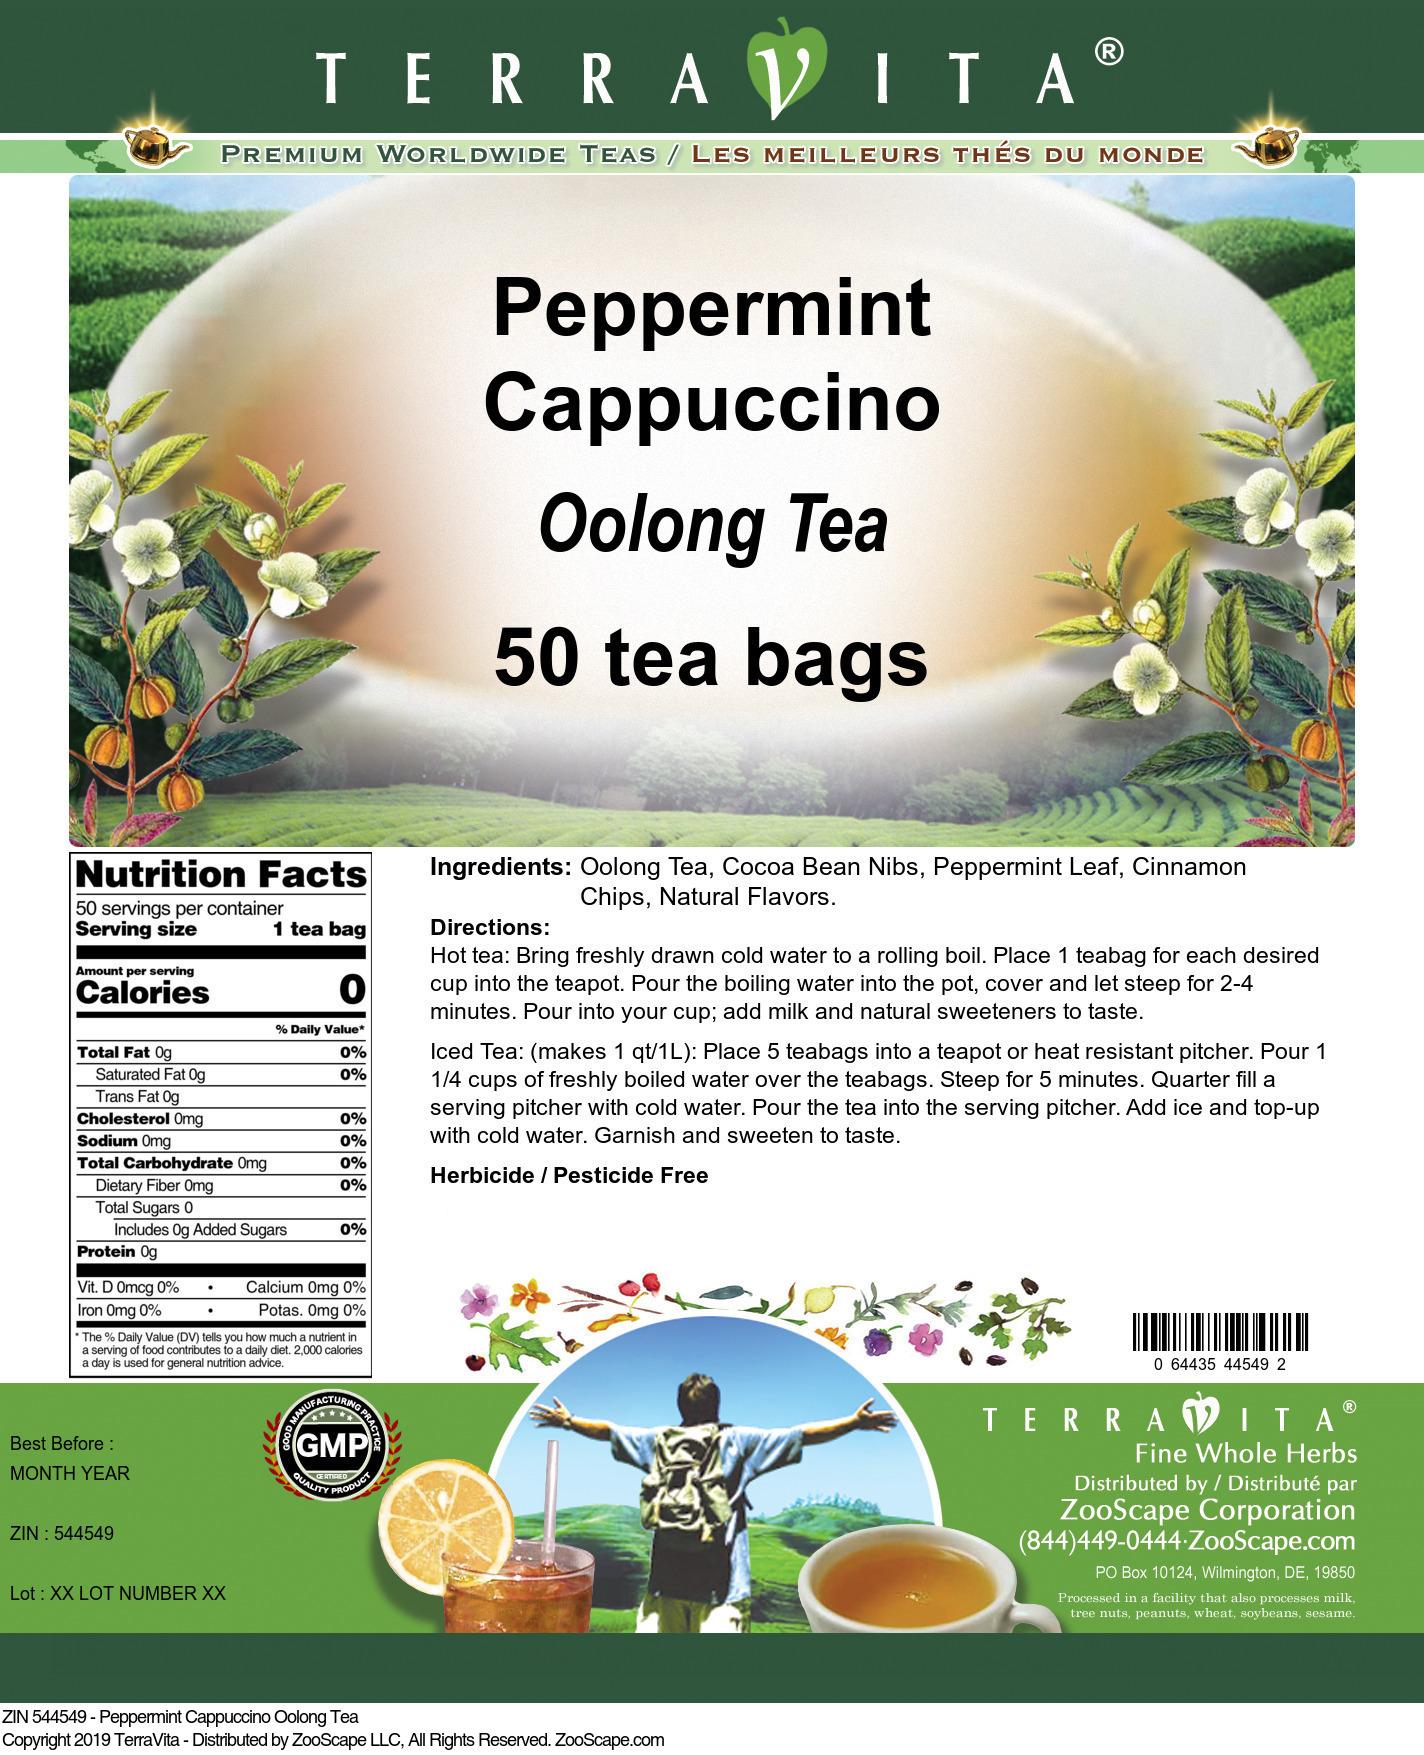 Peppermint Cappuccino Oolong Tea